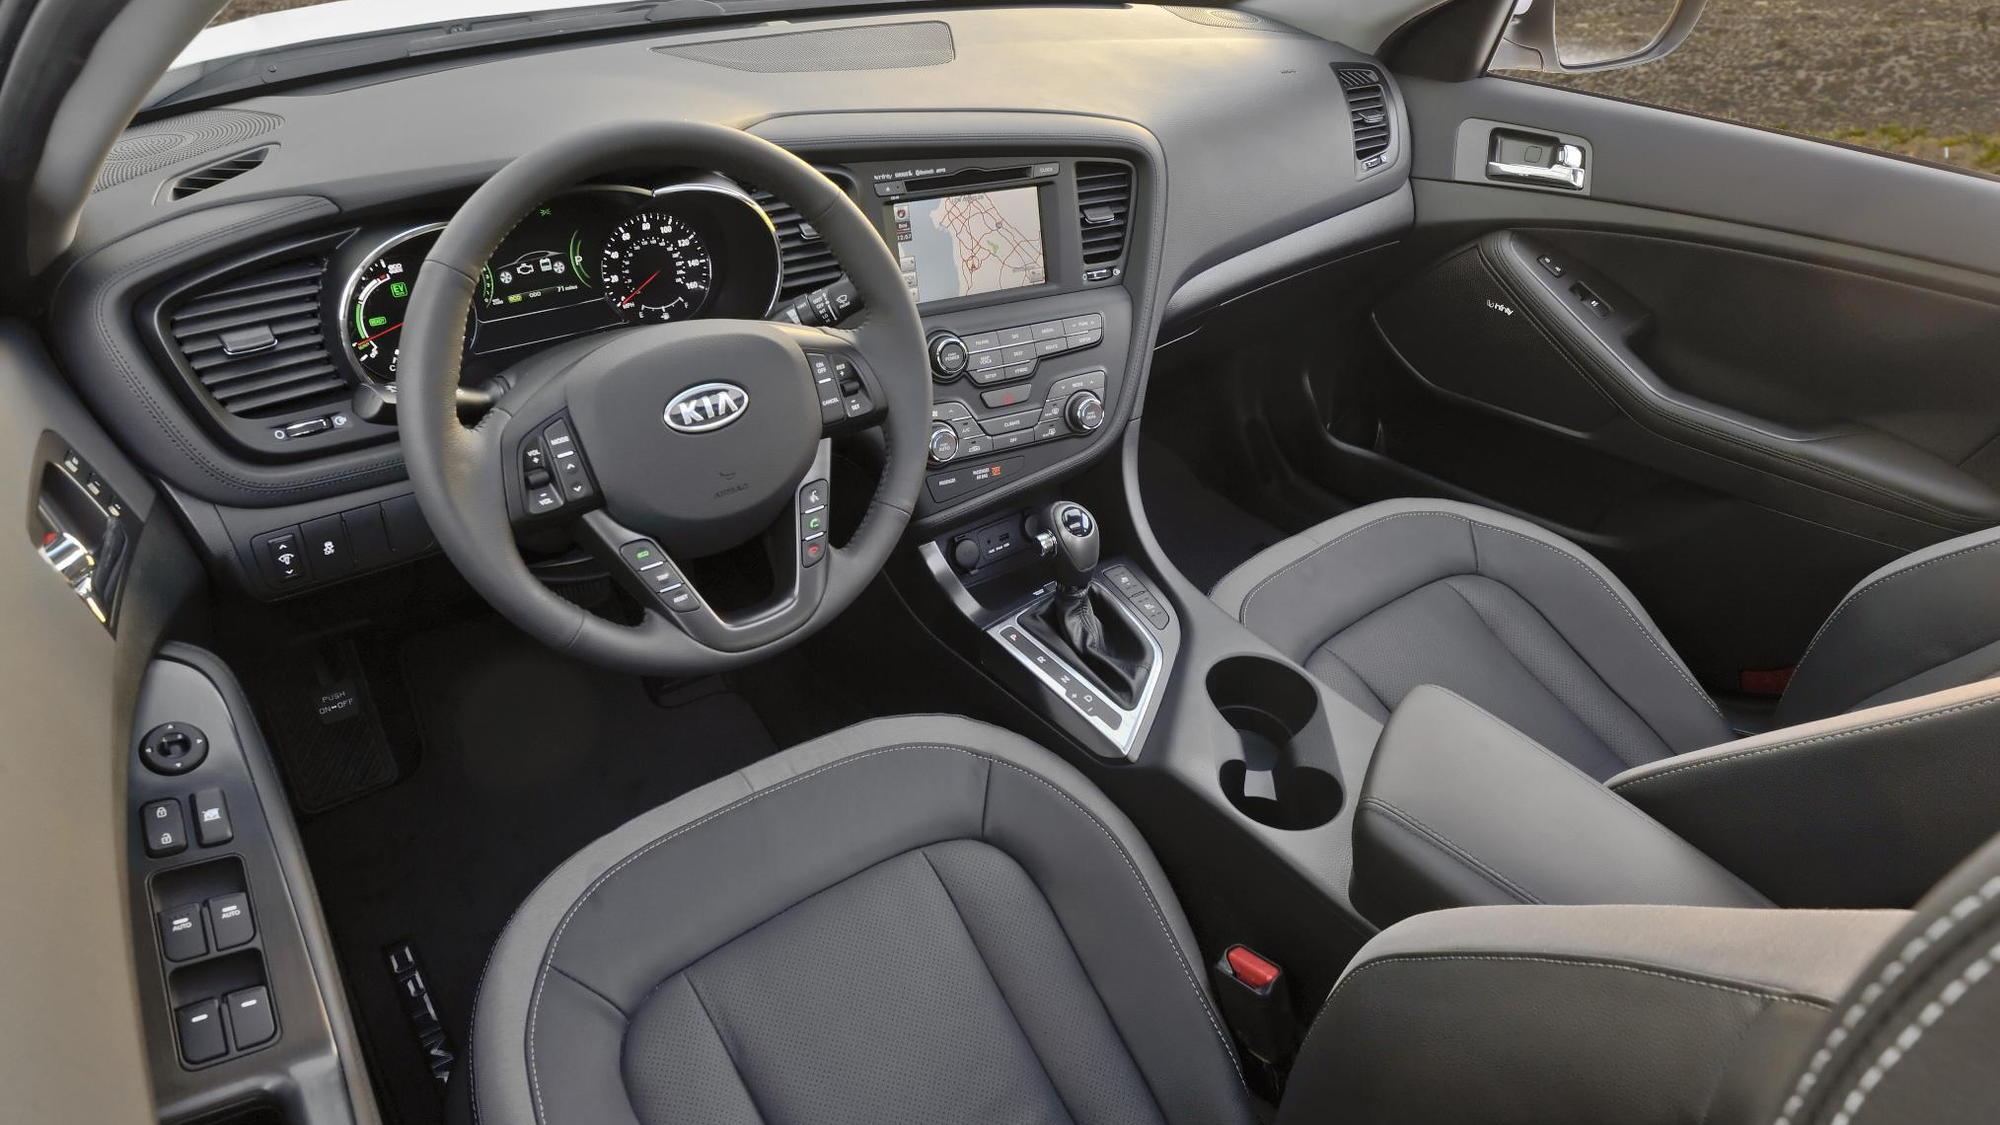 2013 Kia Optima Hybrid: More Space, Improved Gas Mileage